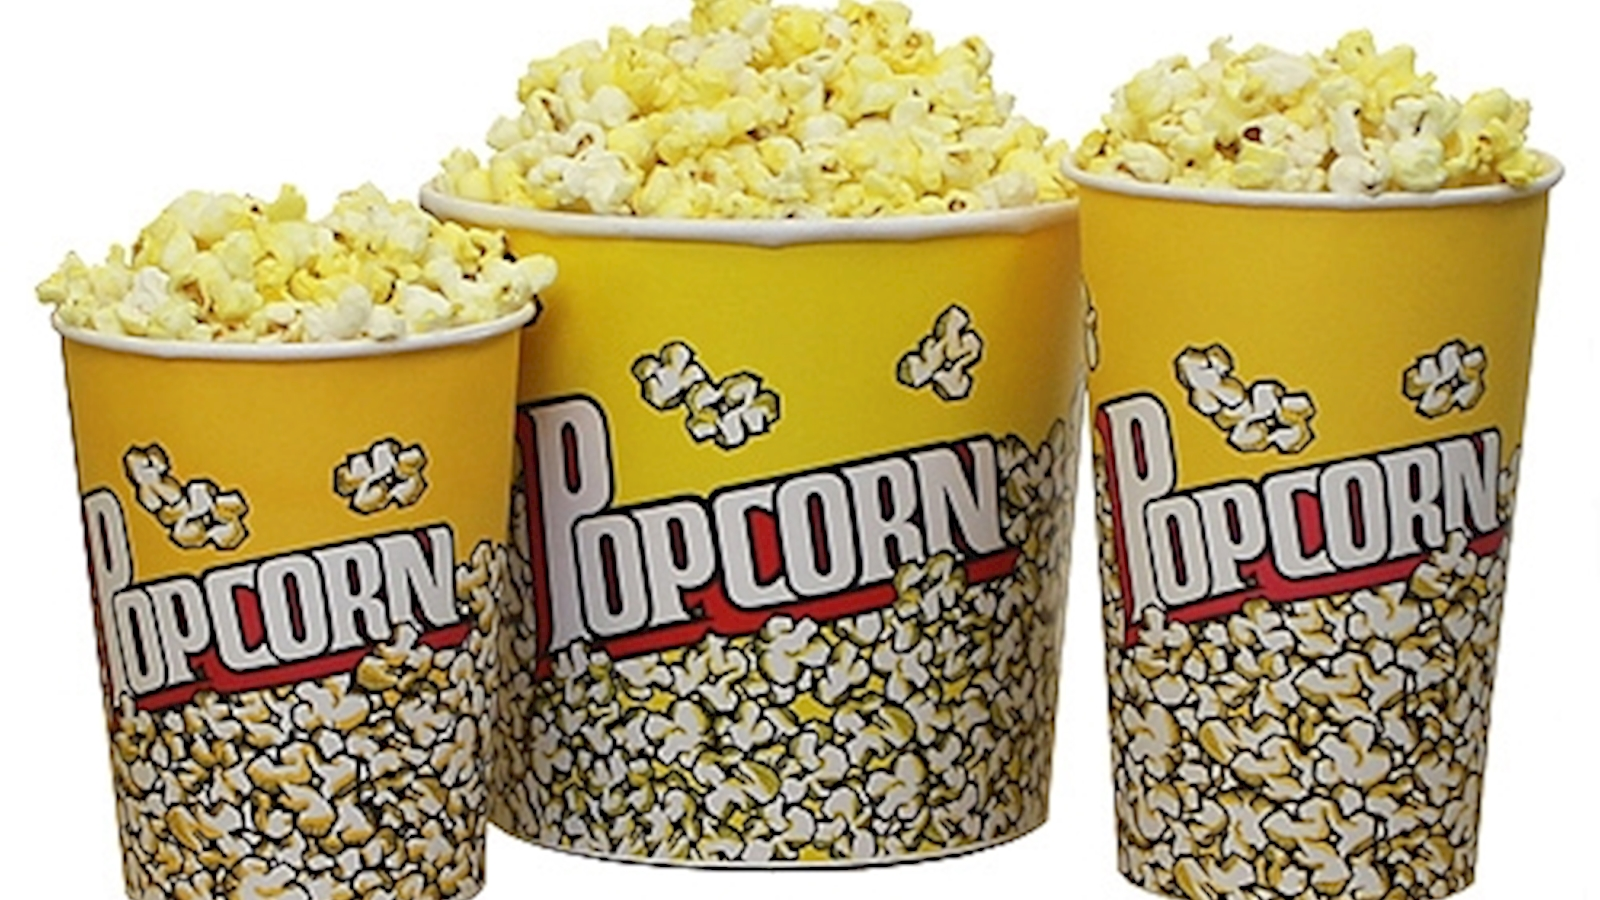 Dick in popcorn bucket